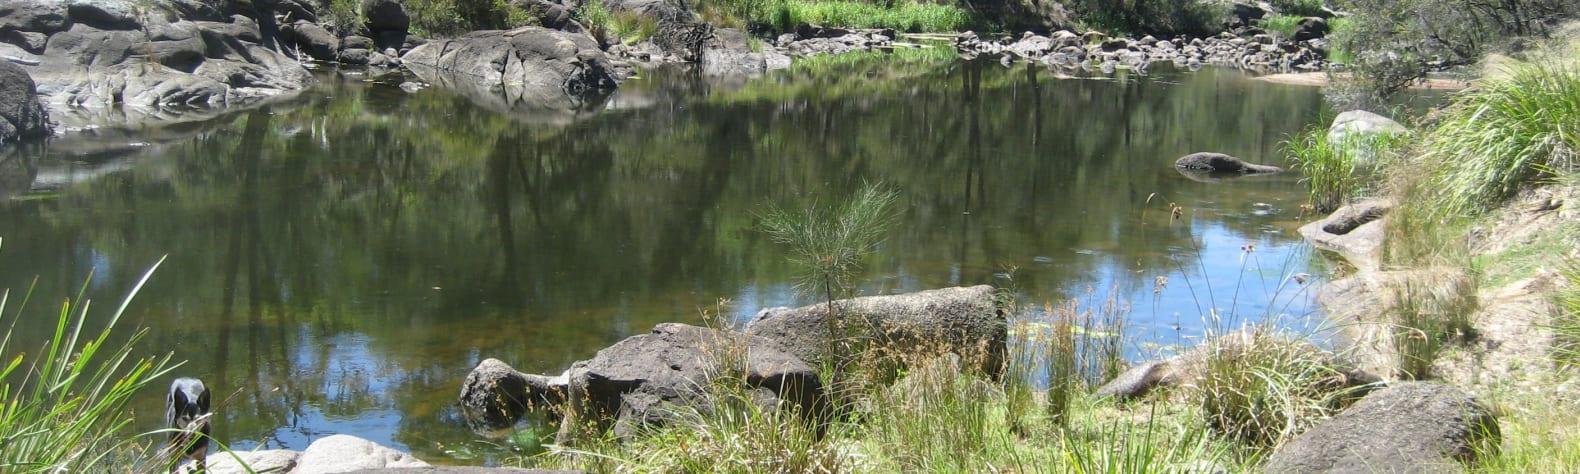 Bai-Yai River Eco-Camp & Artist Retreat